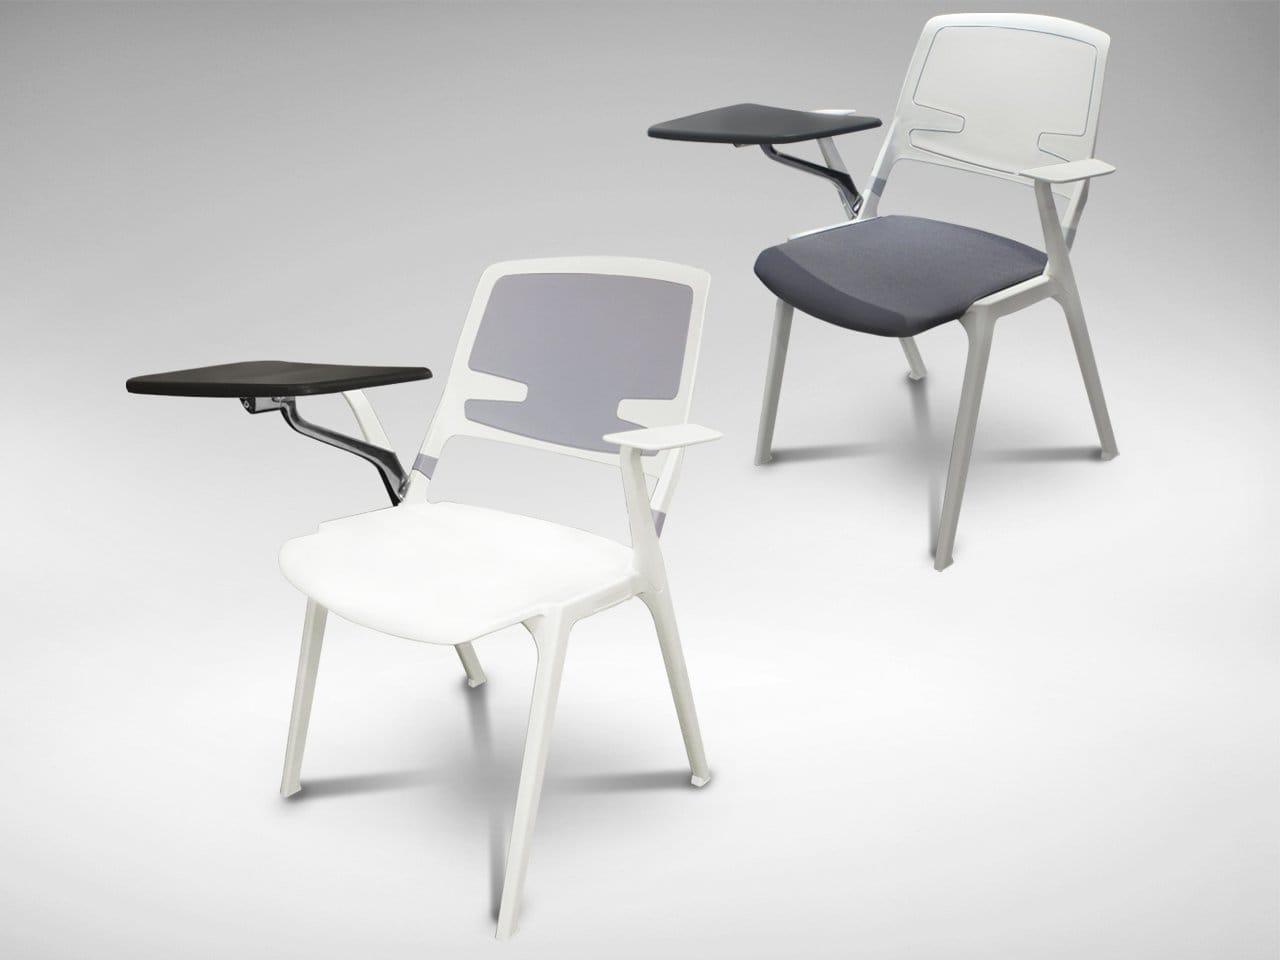 kura armchair tablet comfort design the chair table people